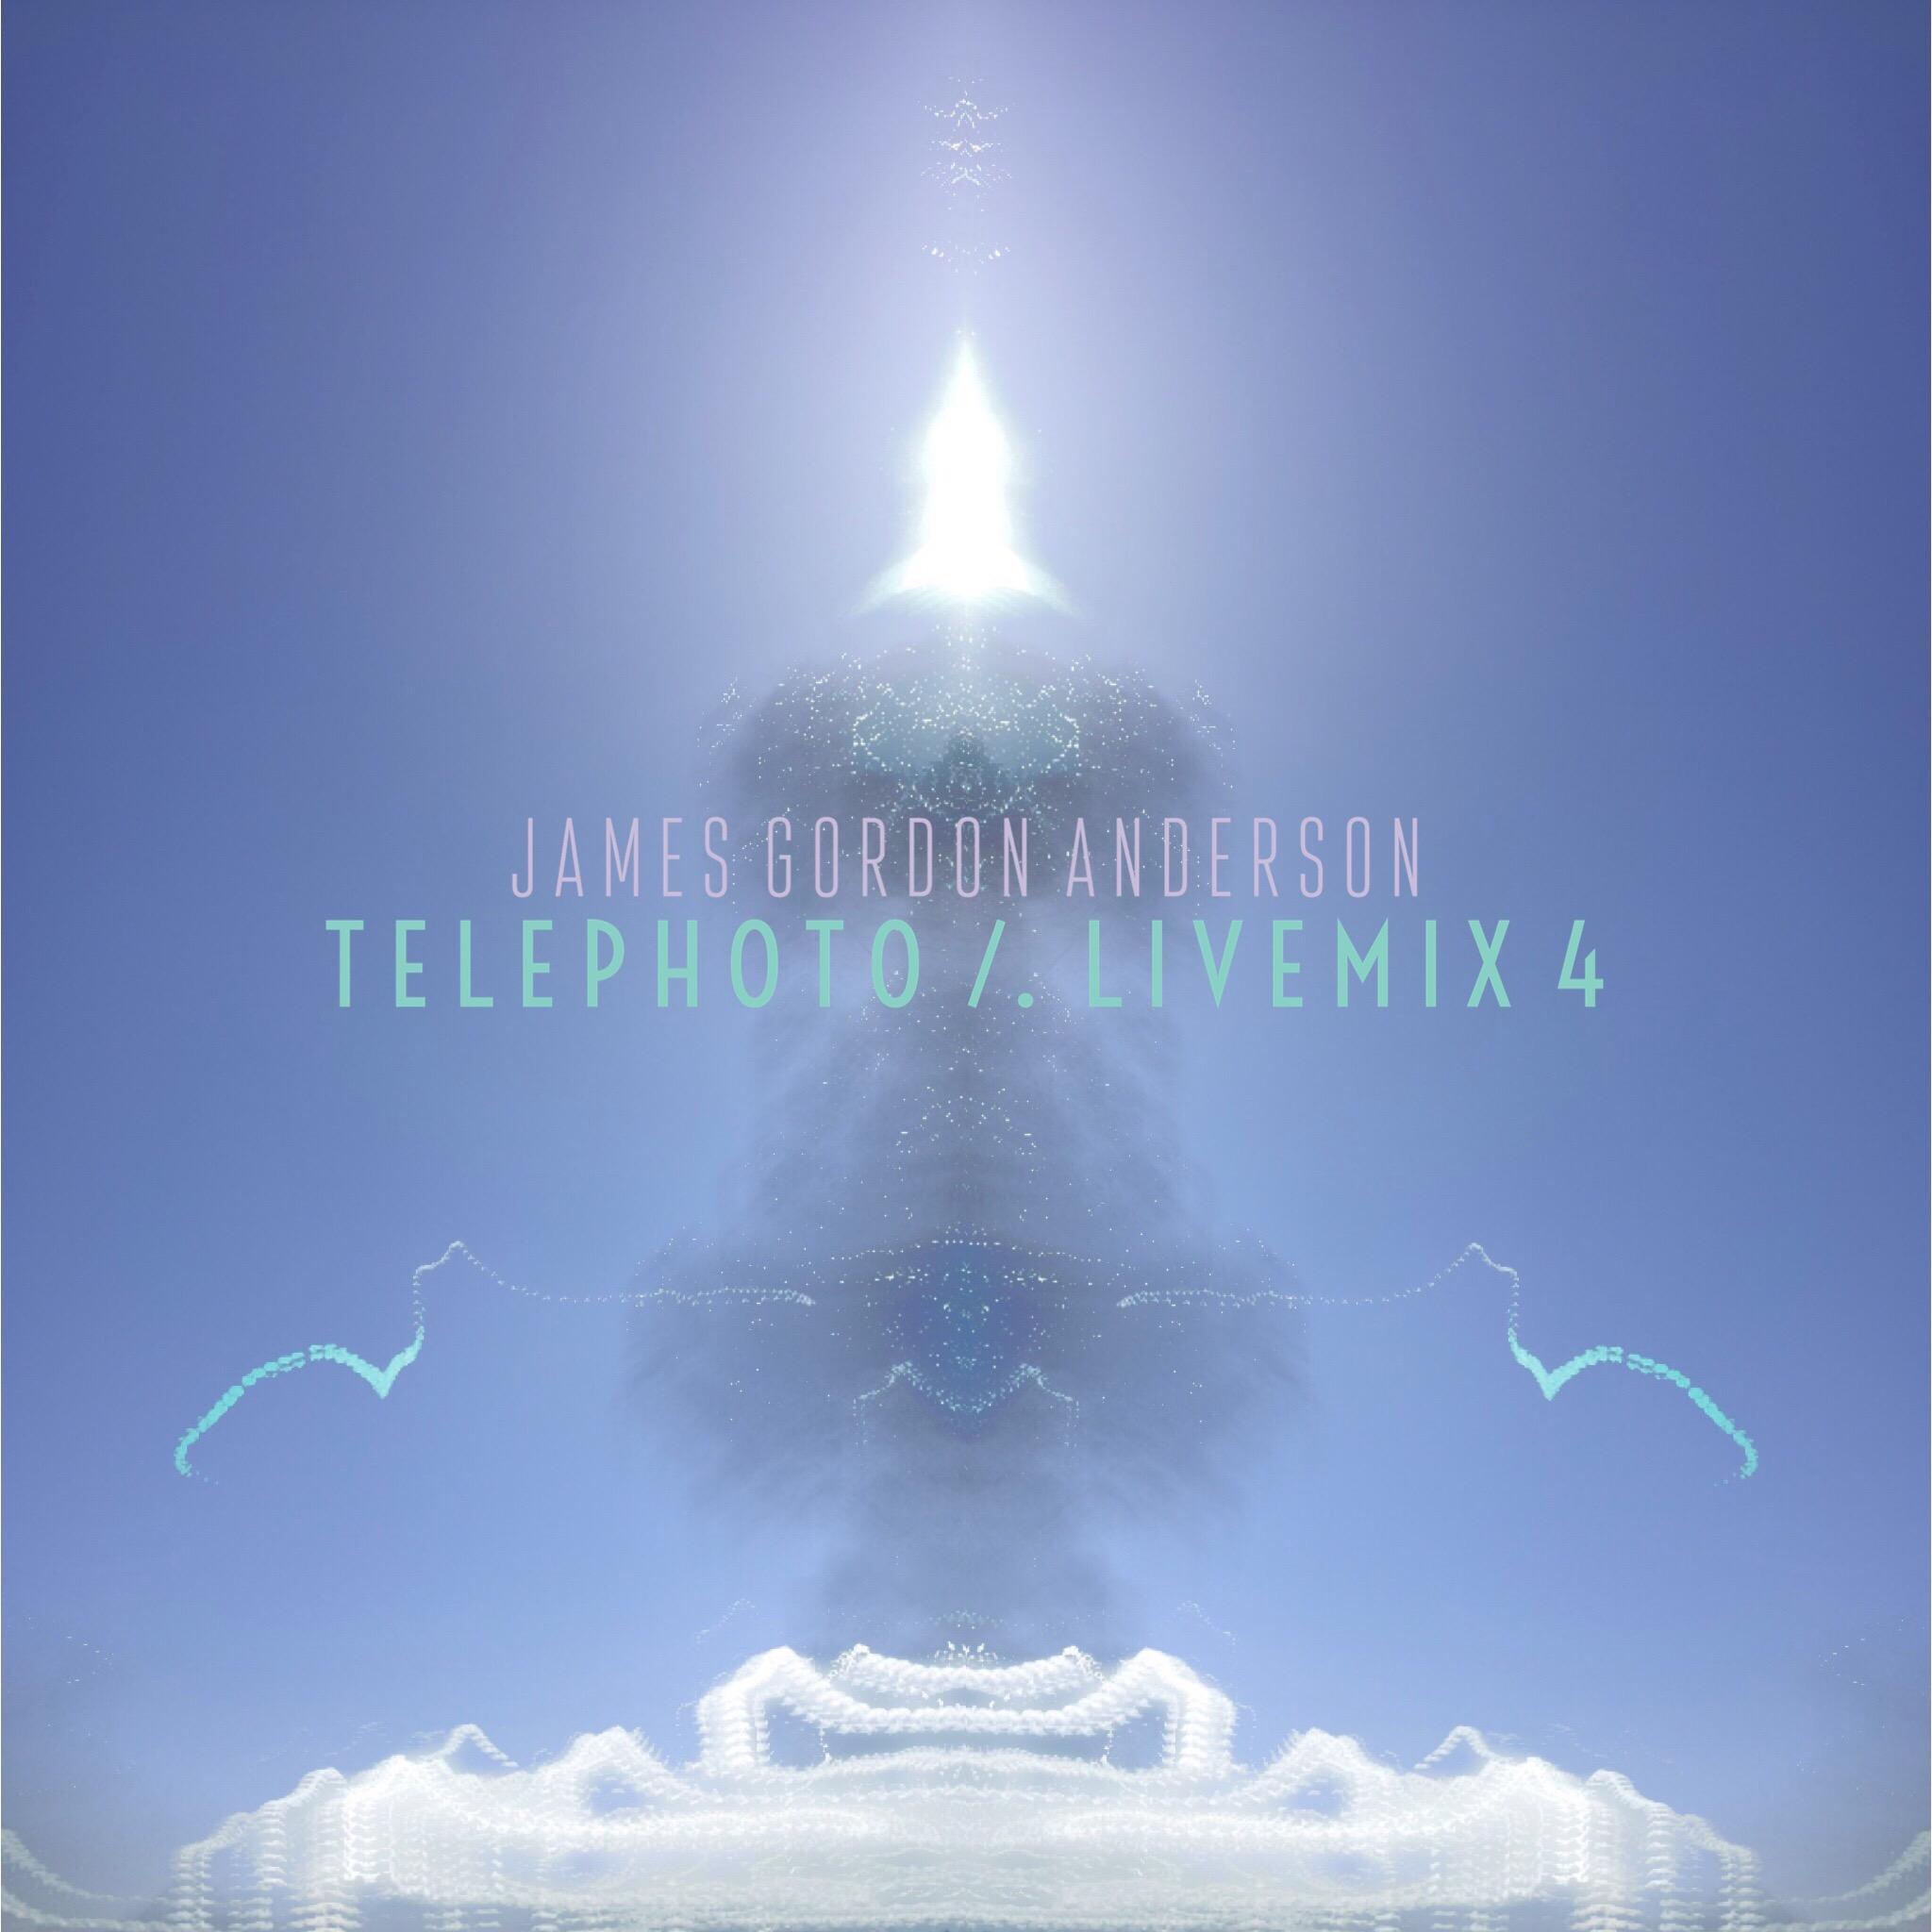 Telephoto - Livemix 4 - Apple Music